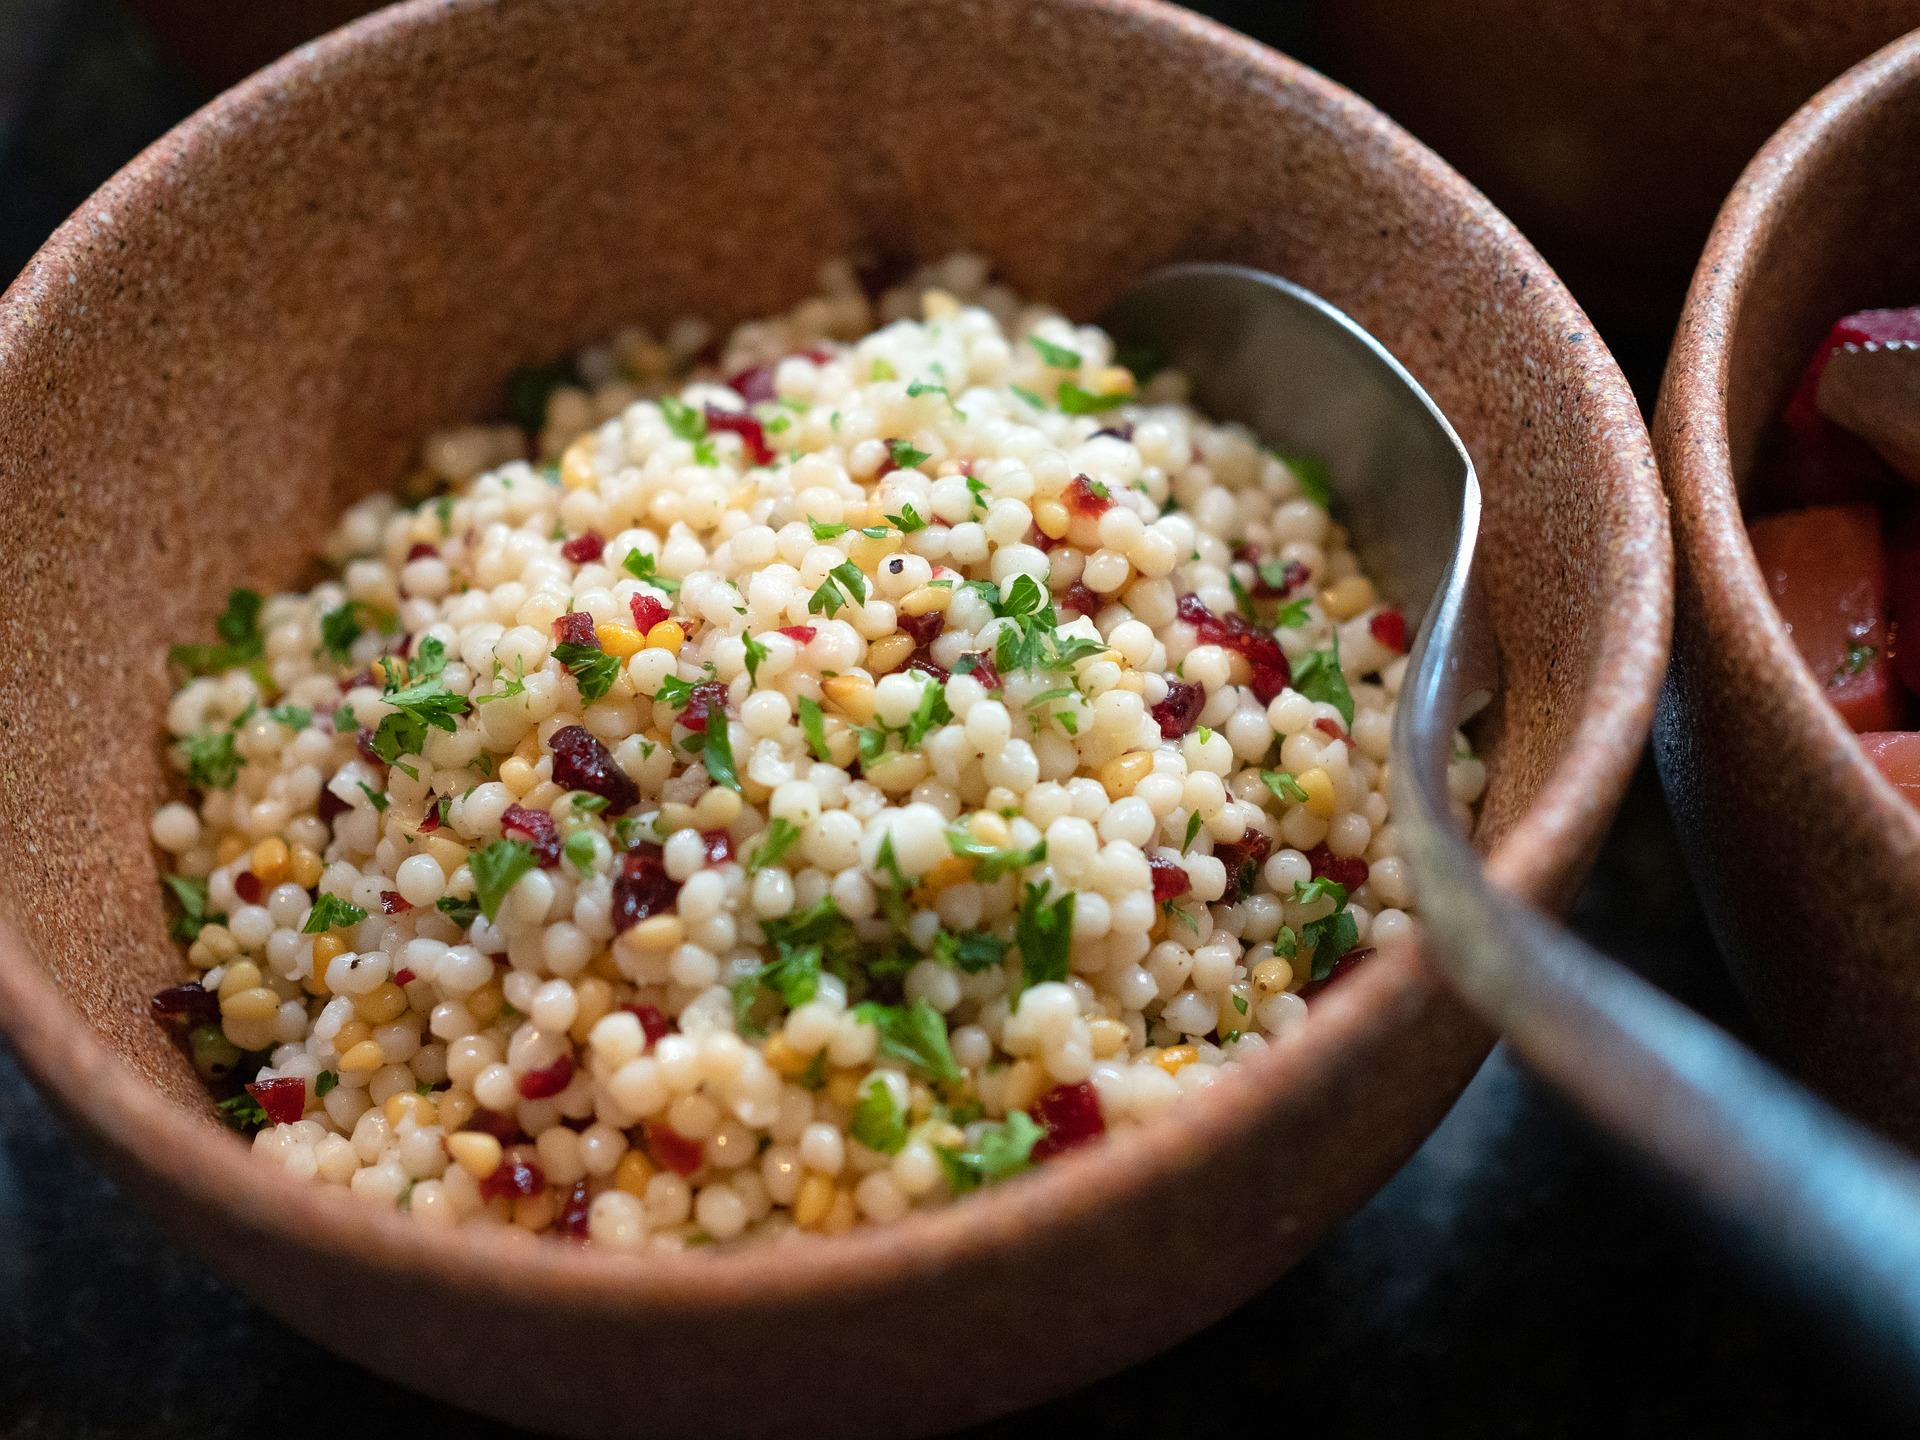 fregula sarda con verdure ricetta